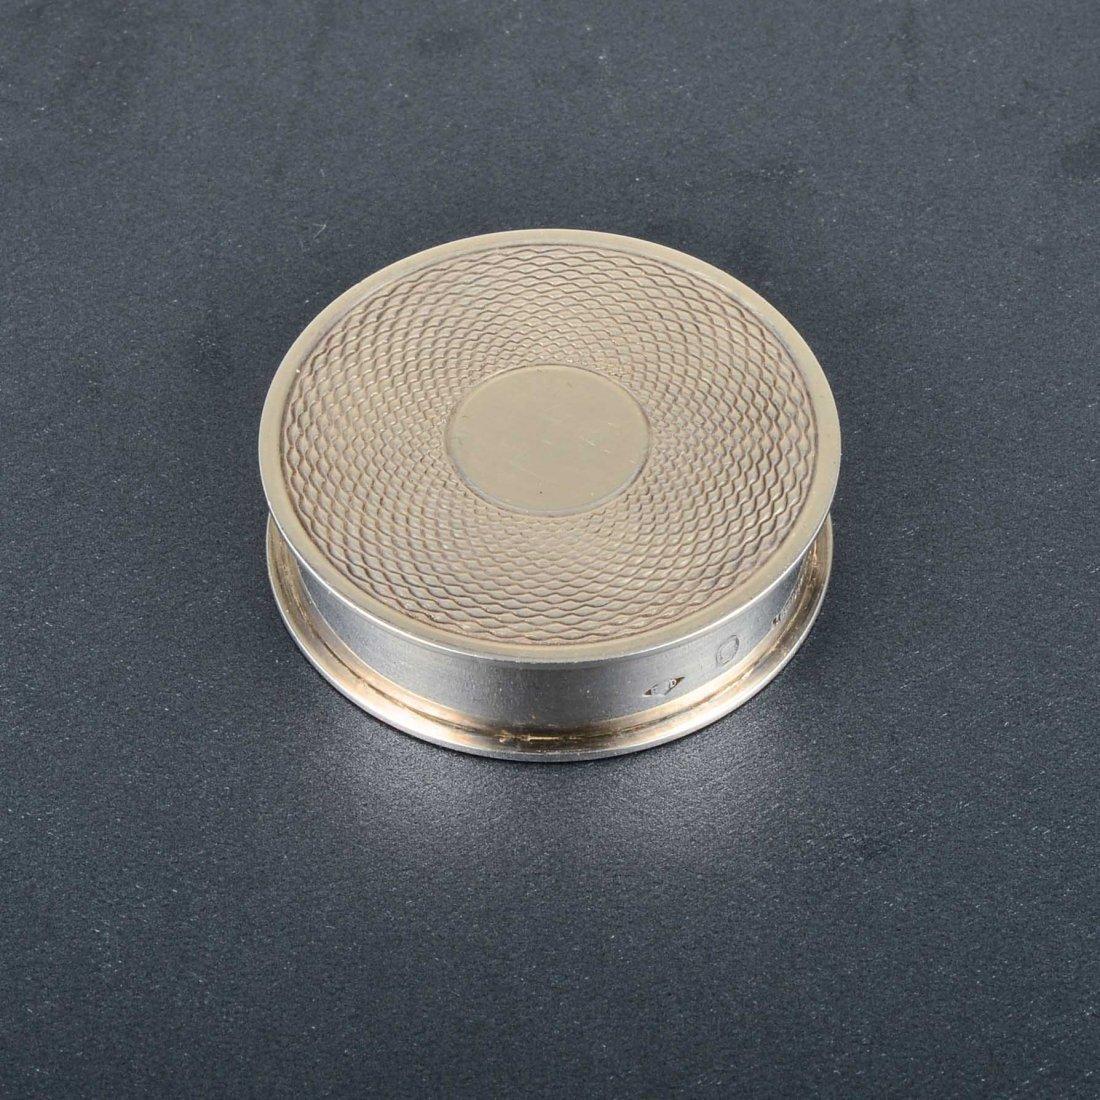 Hermes Silver Pillbox